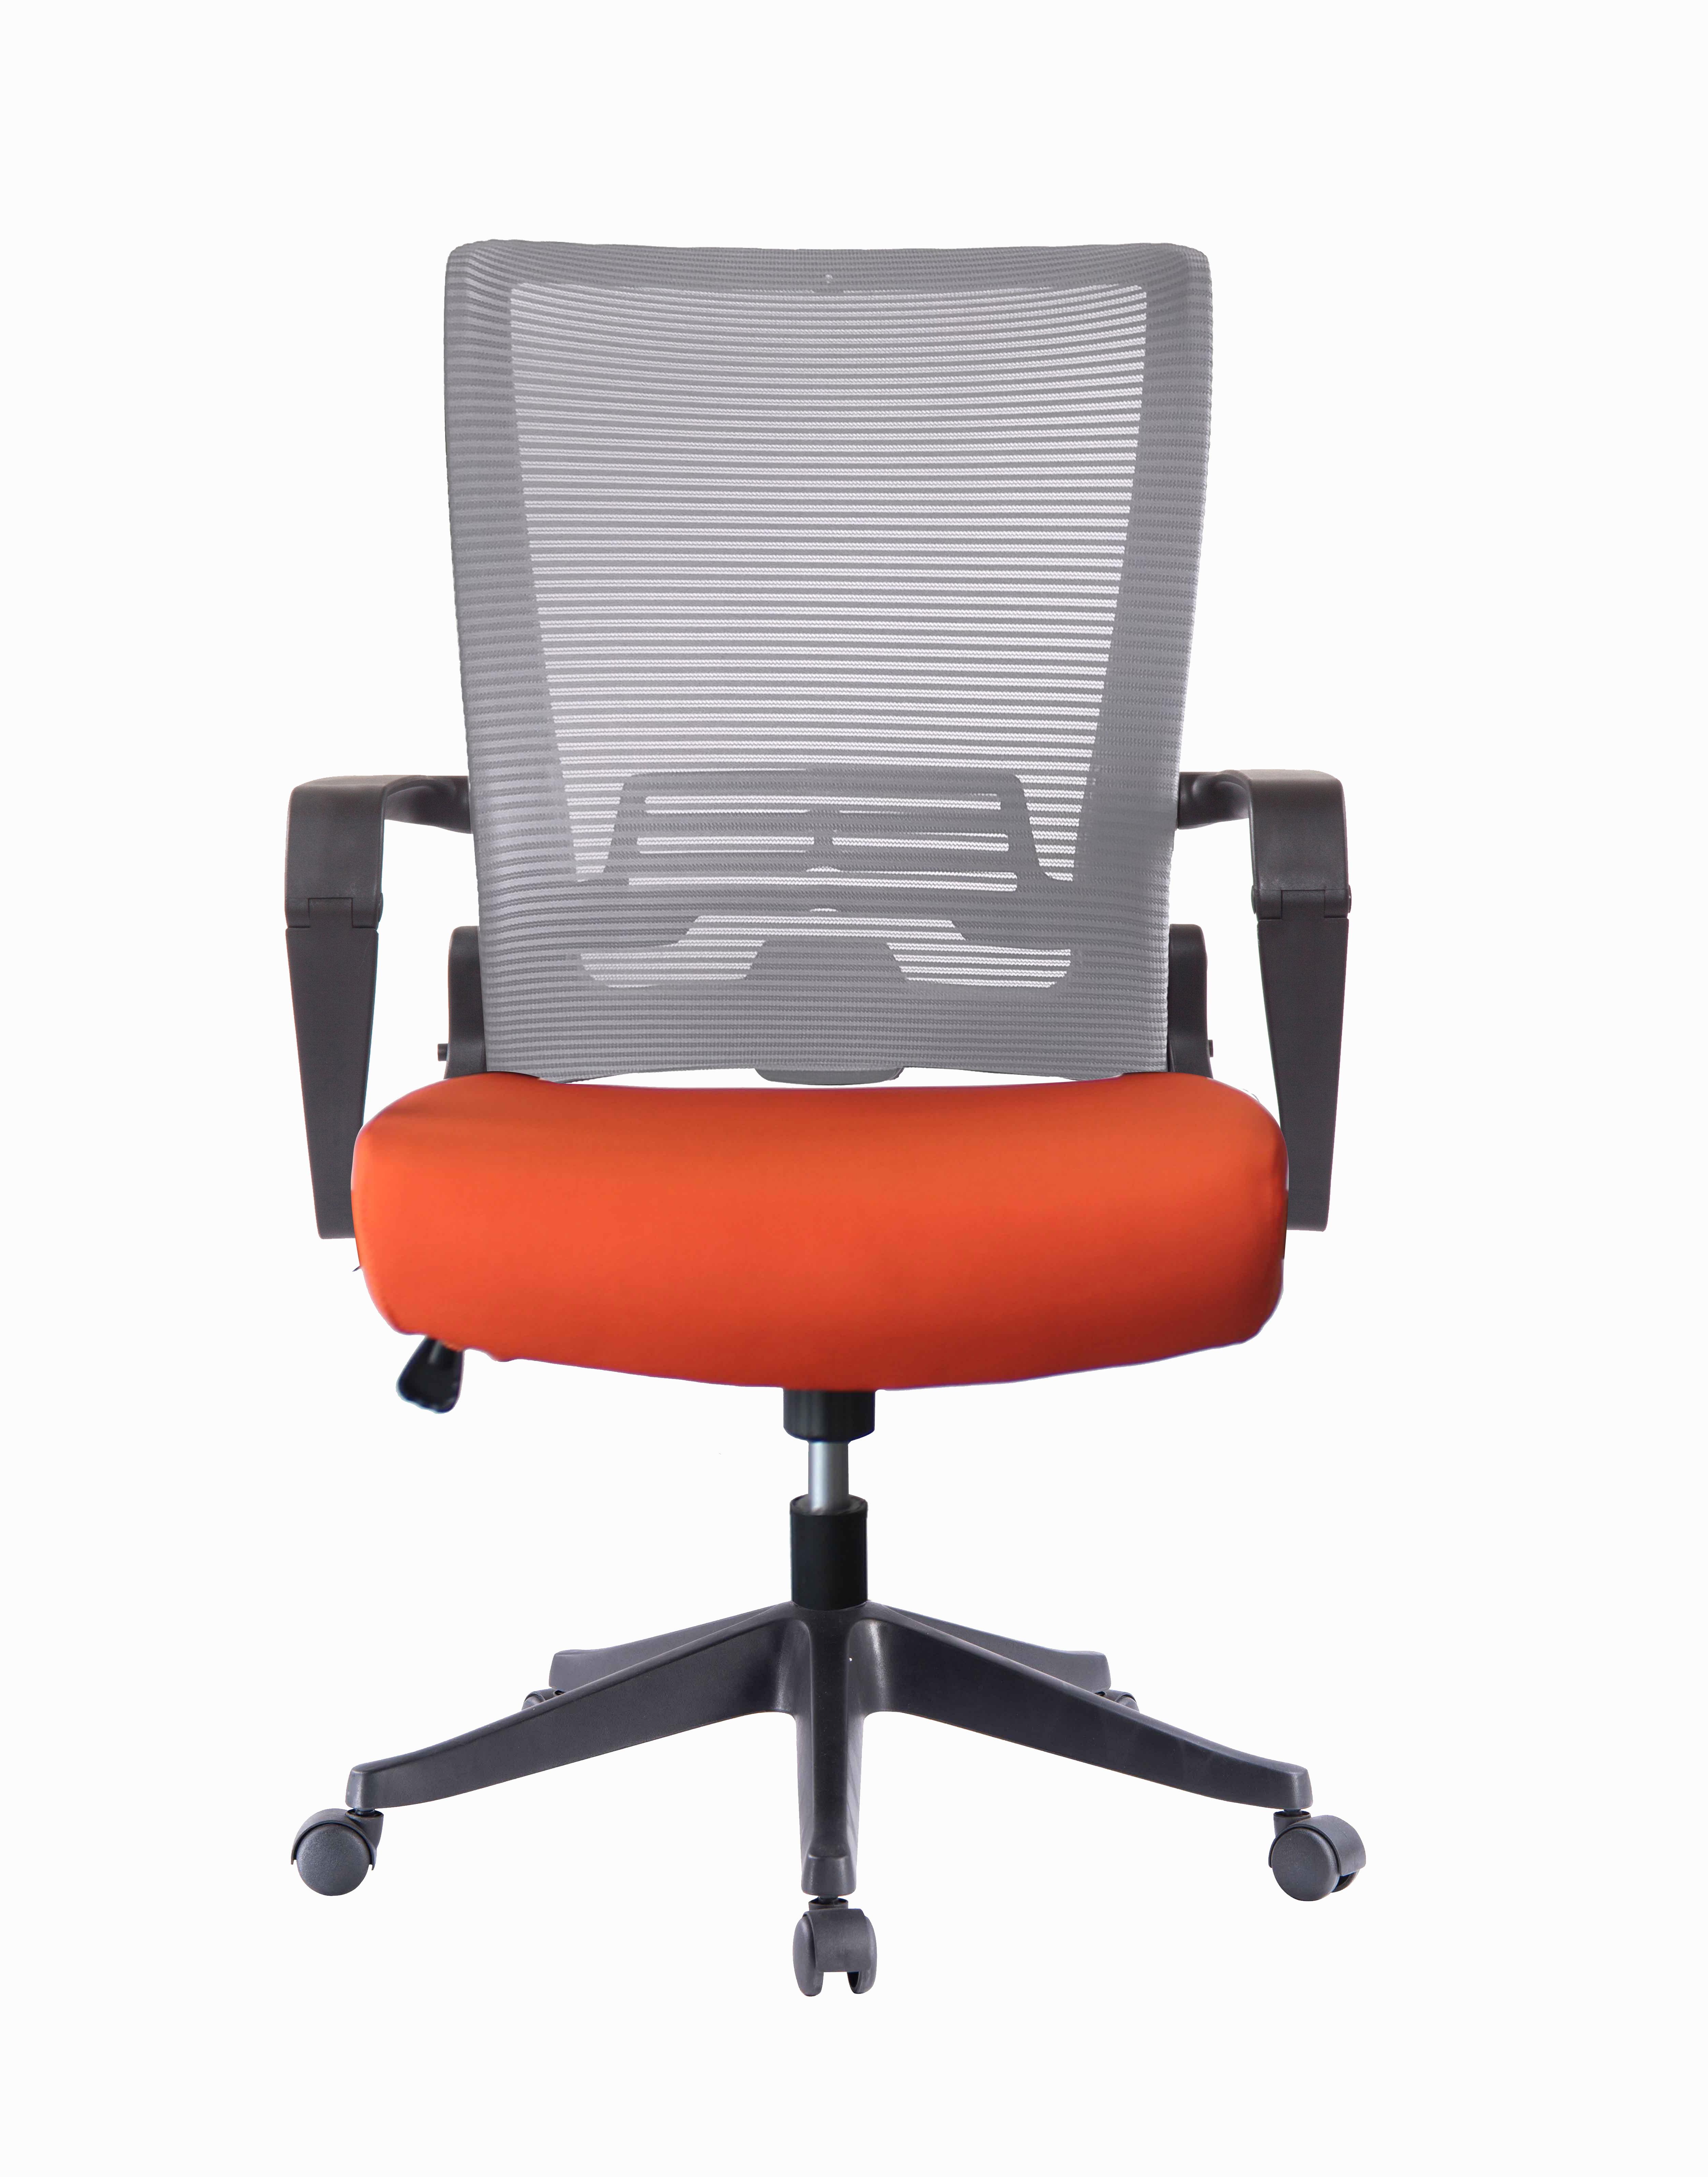 Impecgear Ergonomic Office Chair High